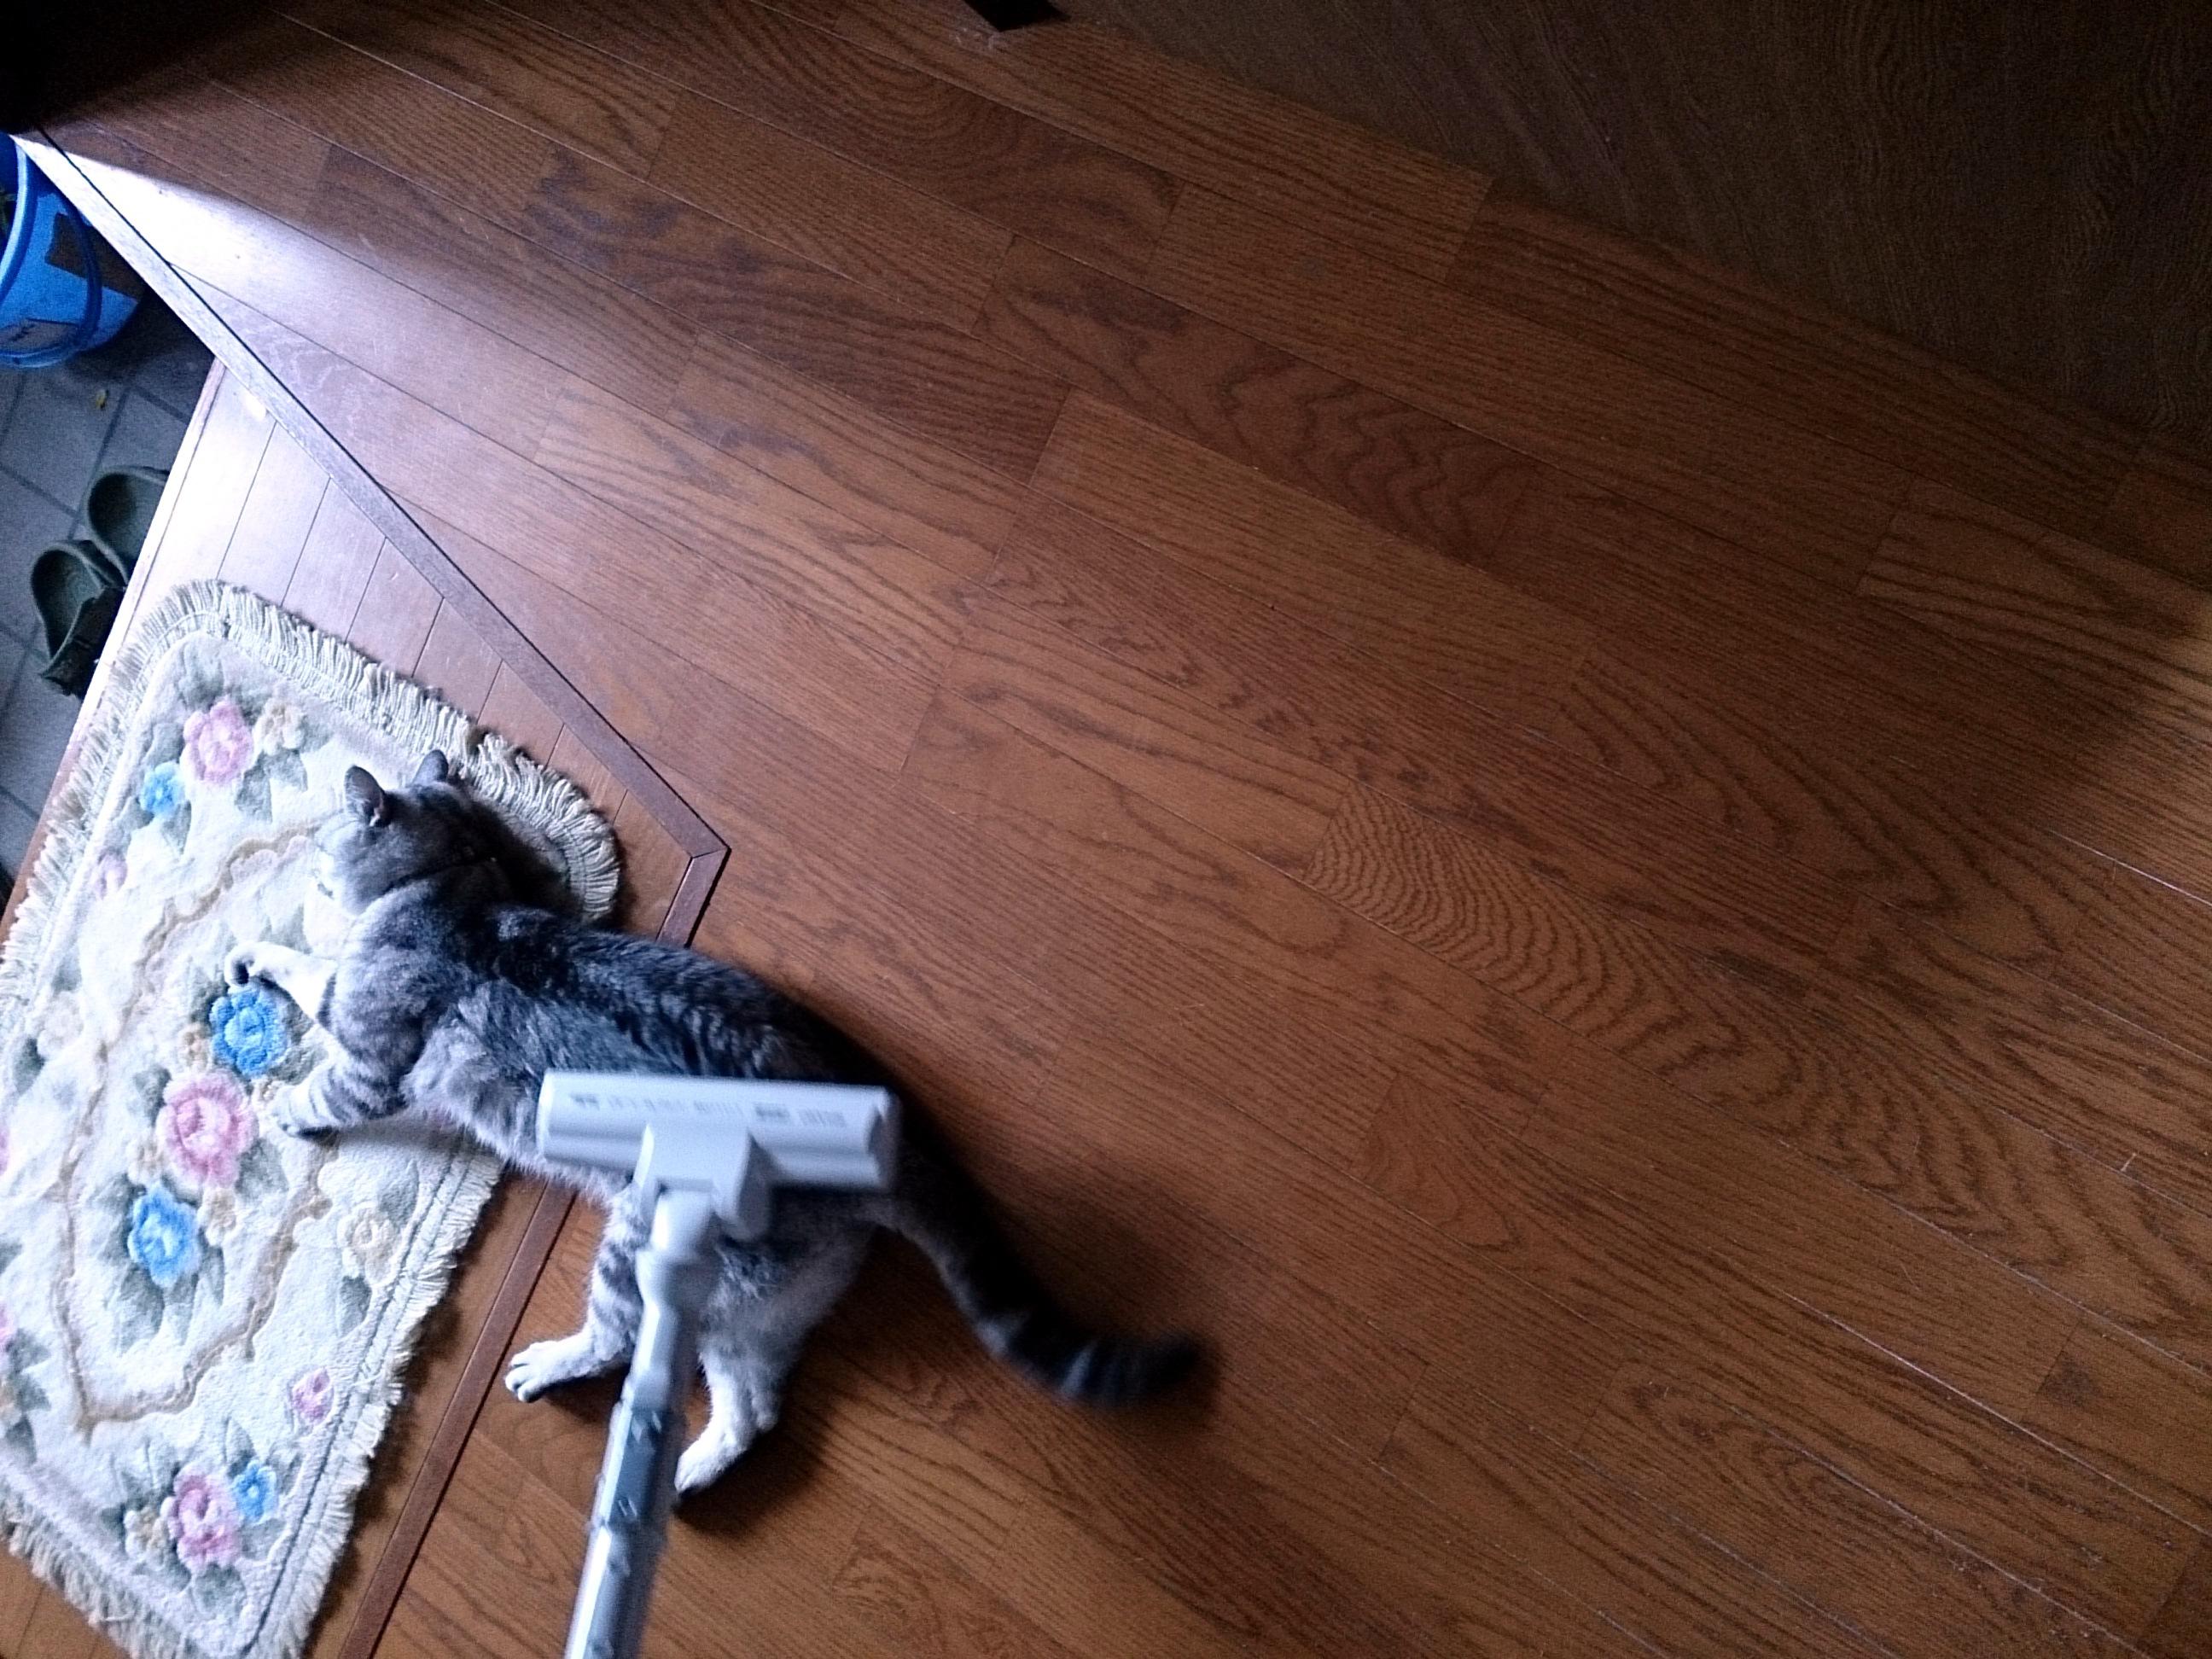 Cat_to_be_crean_20140607-02.jpg